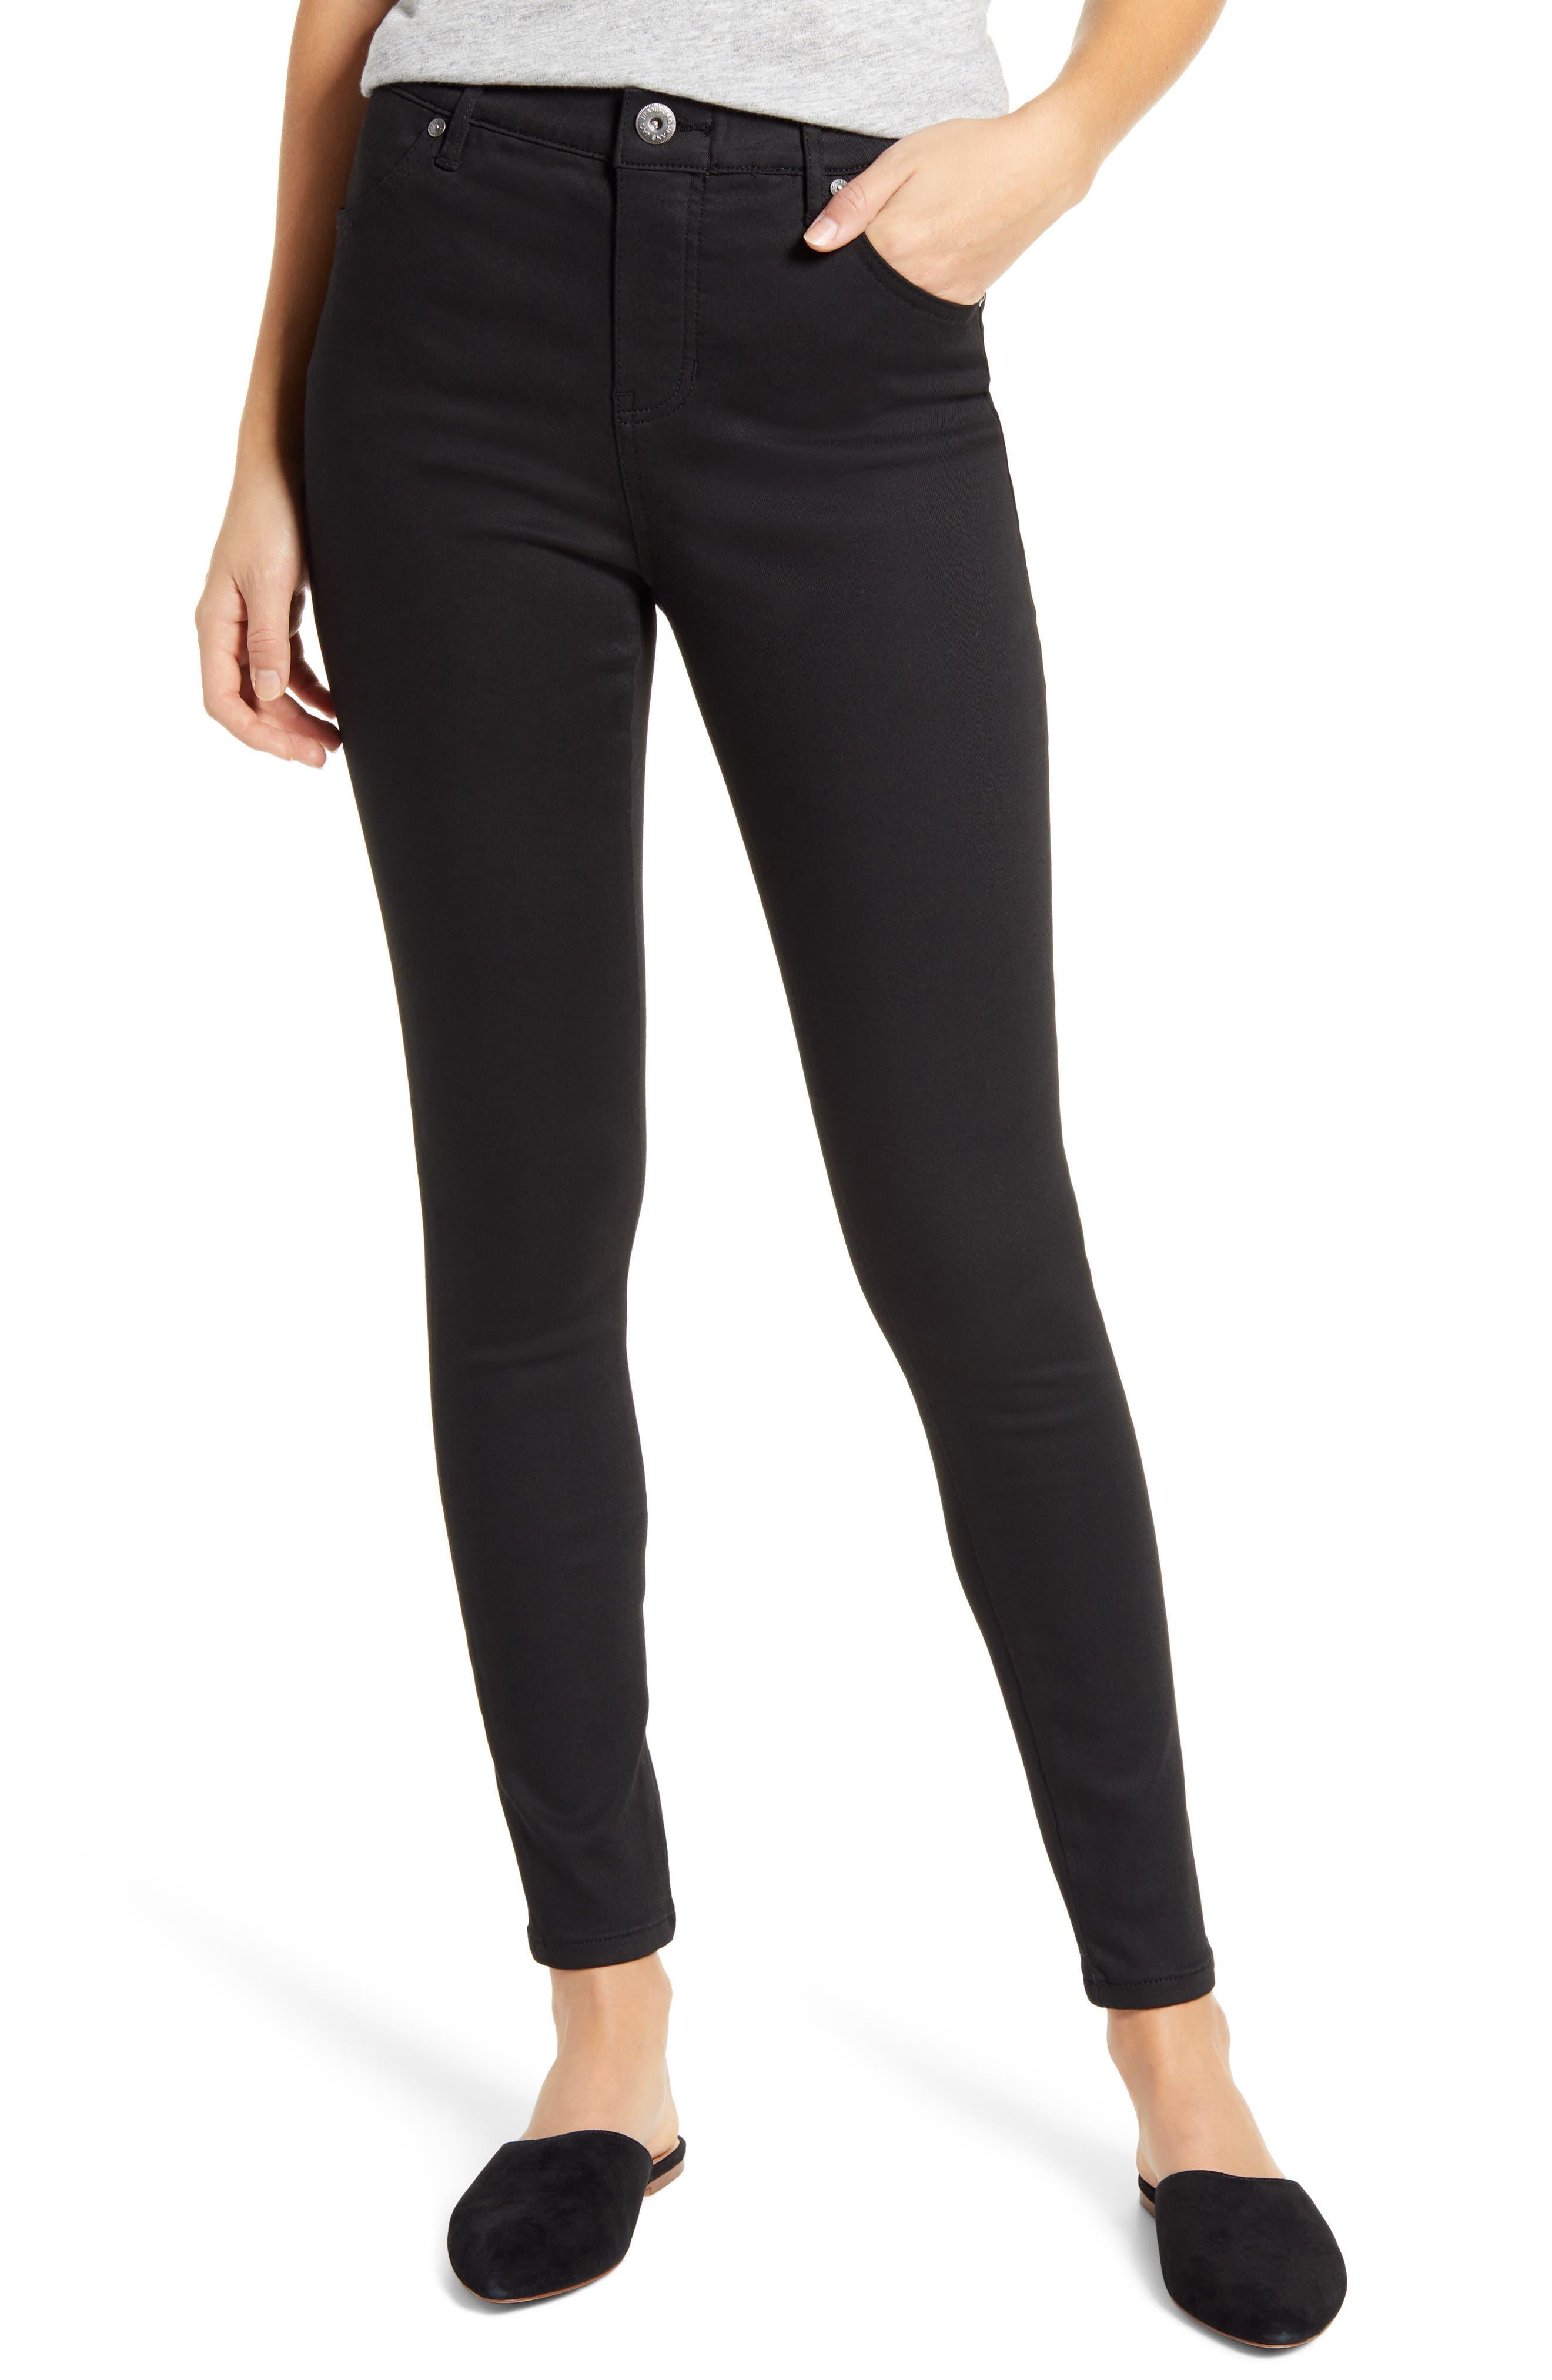 Valentina High Waist Ankle Skinny Jeans